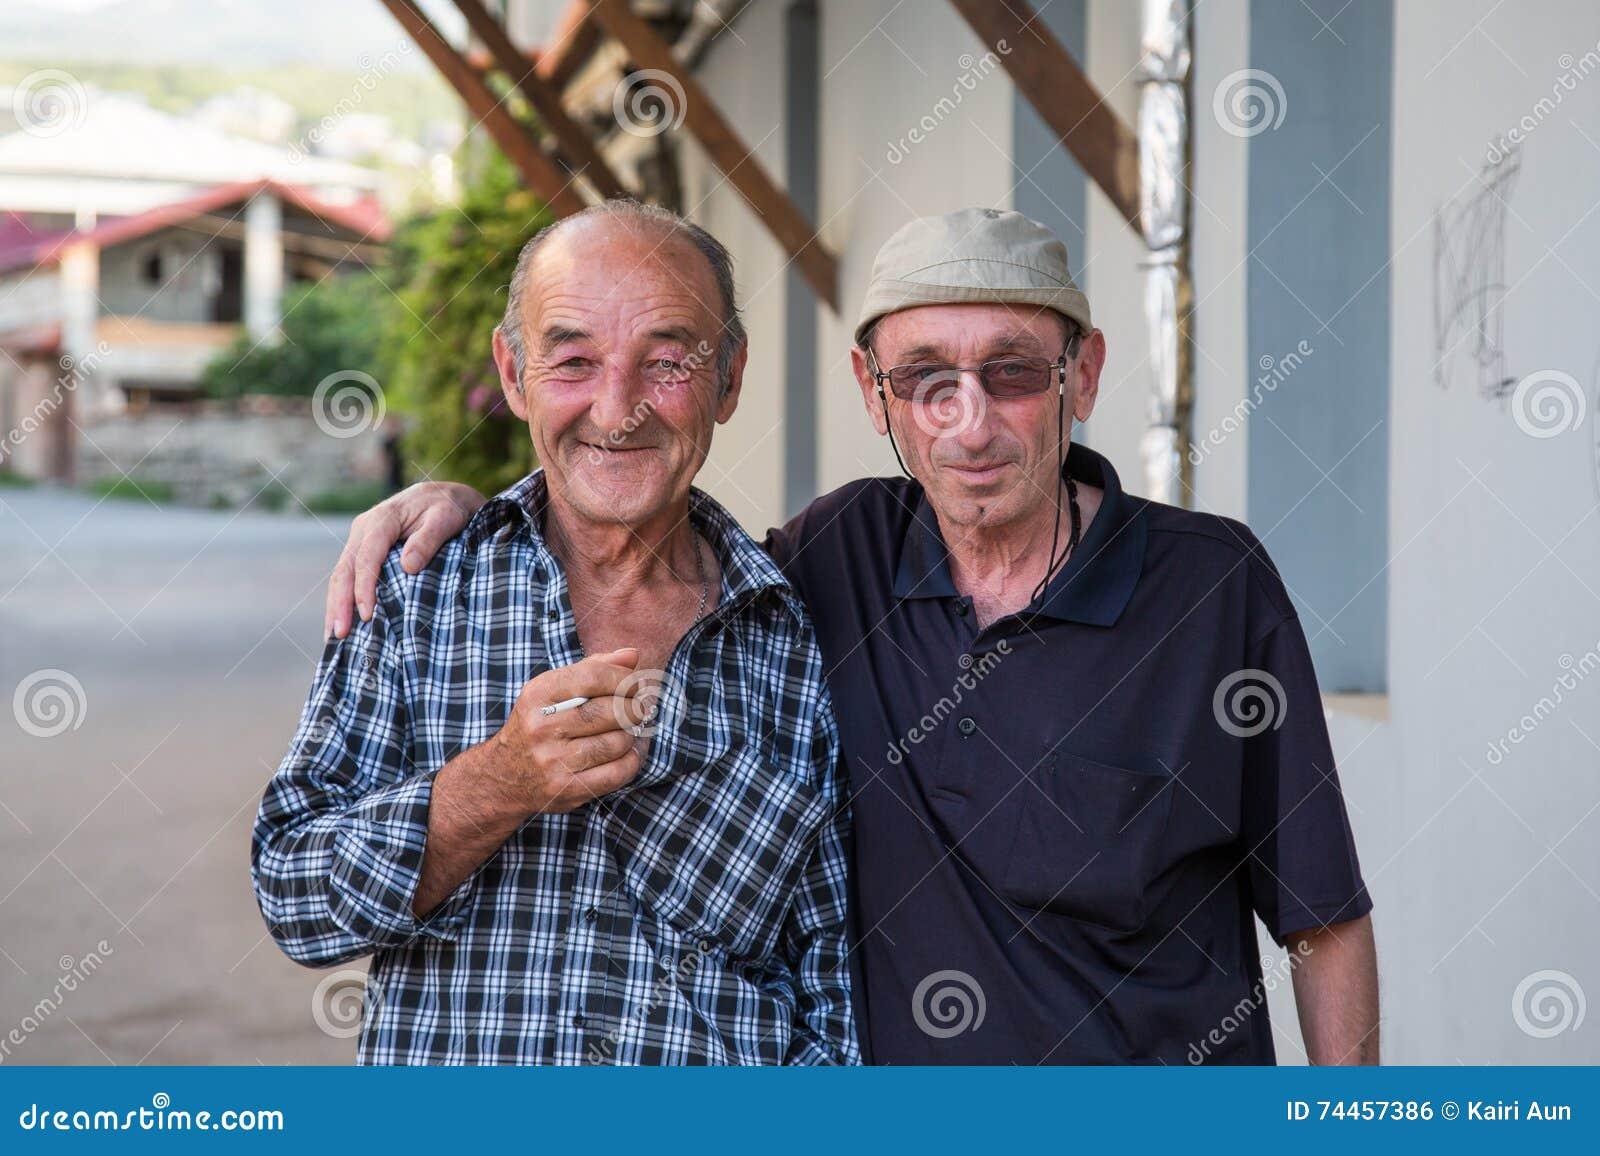 Georgian men